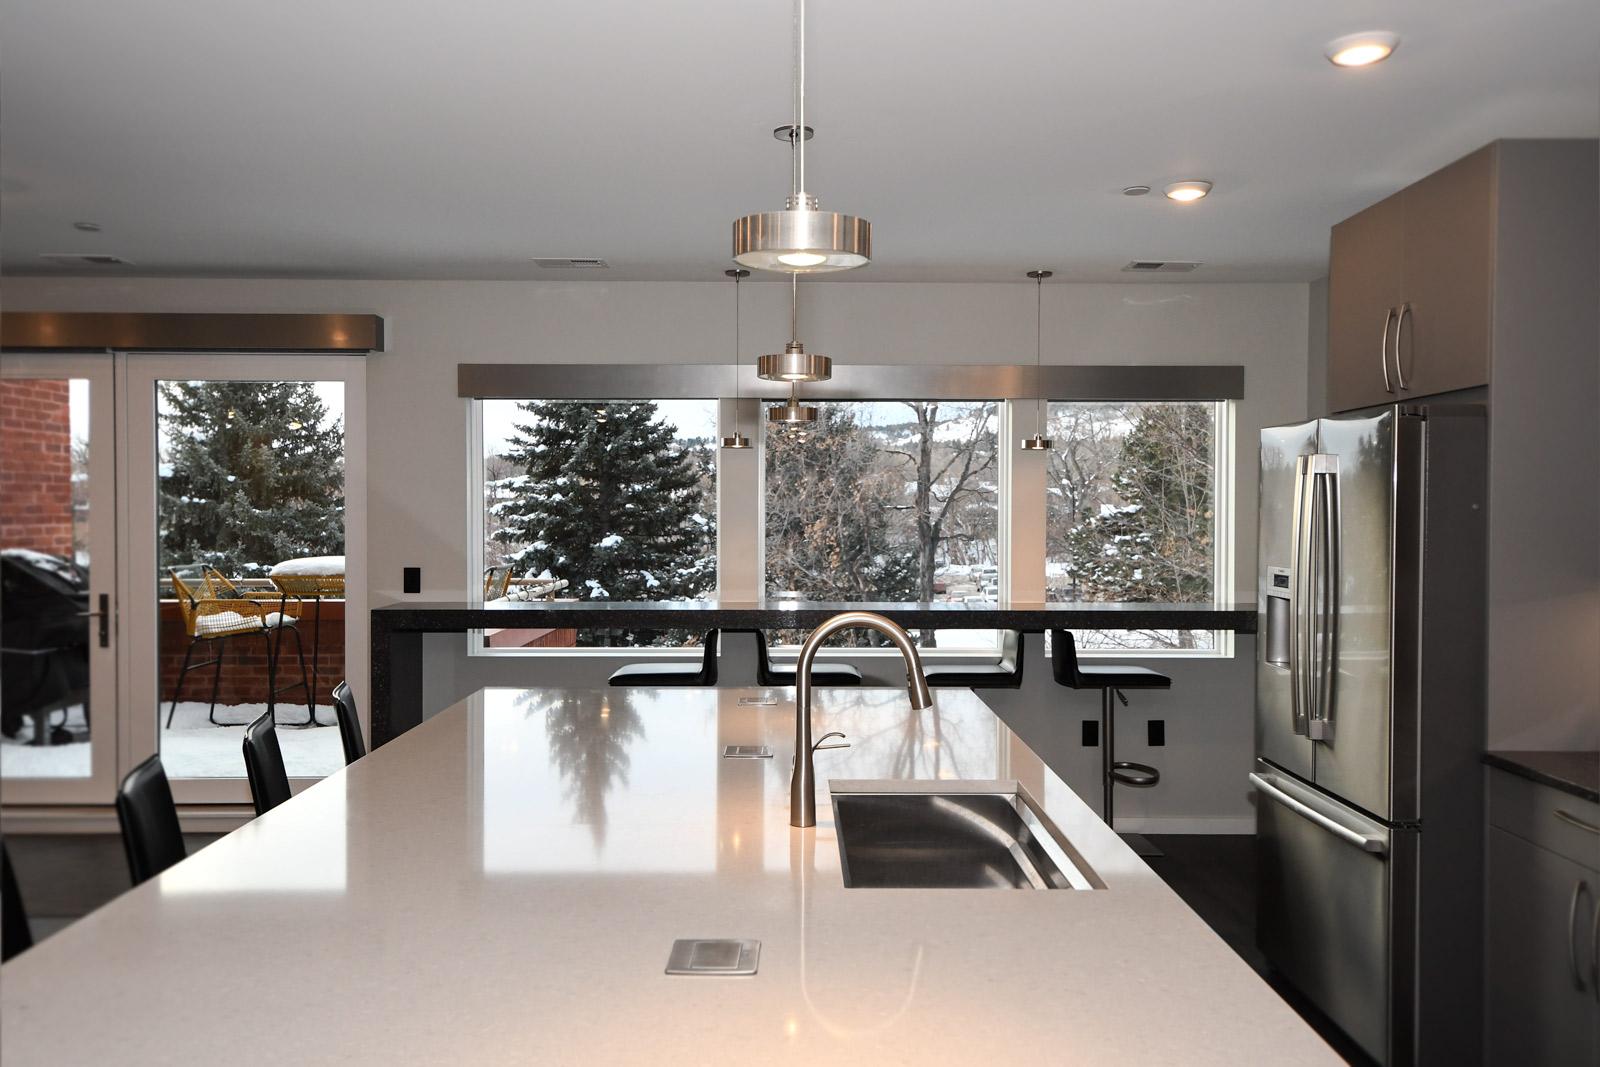 624 pearl 304 kitchen island bar porch